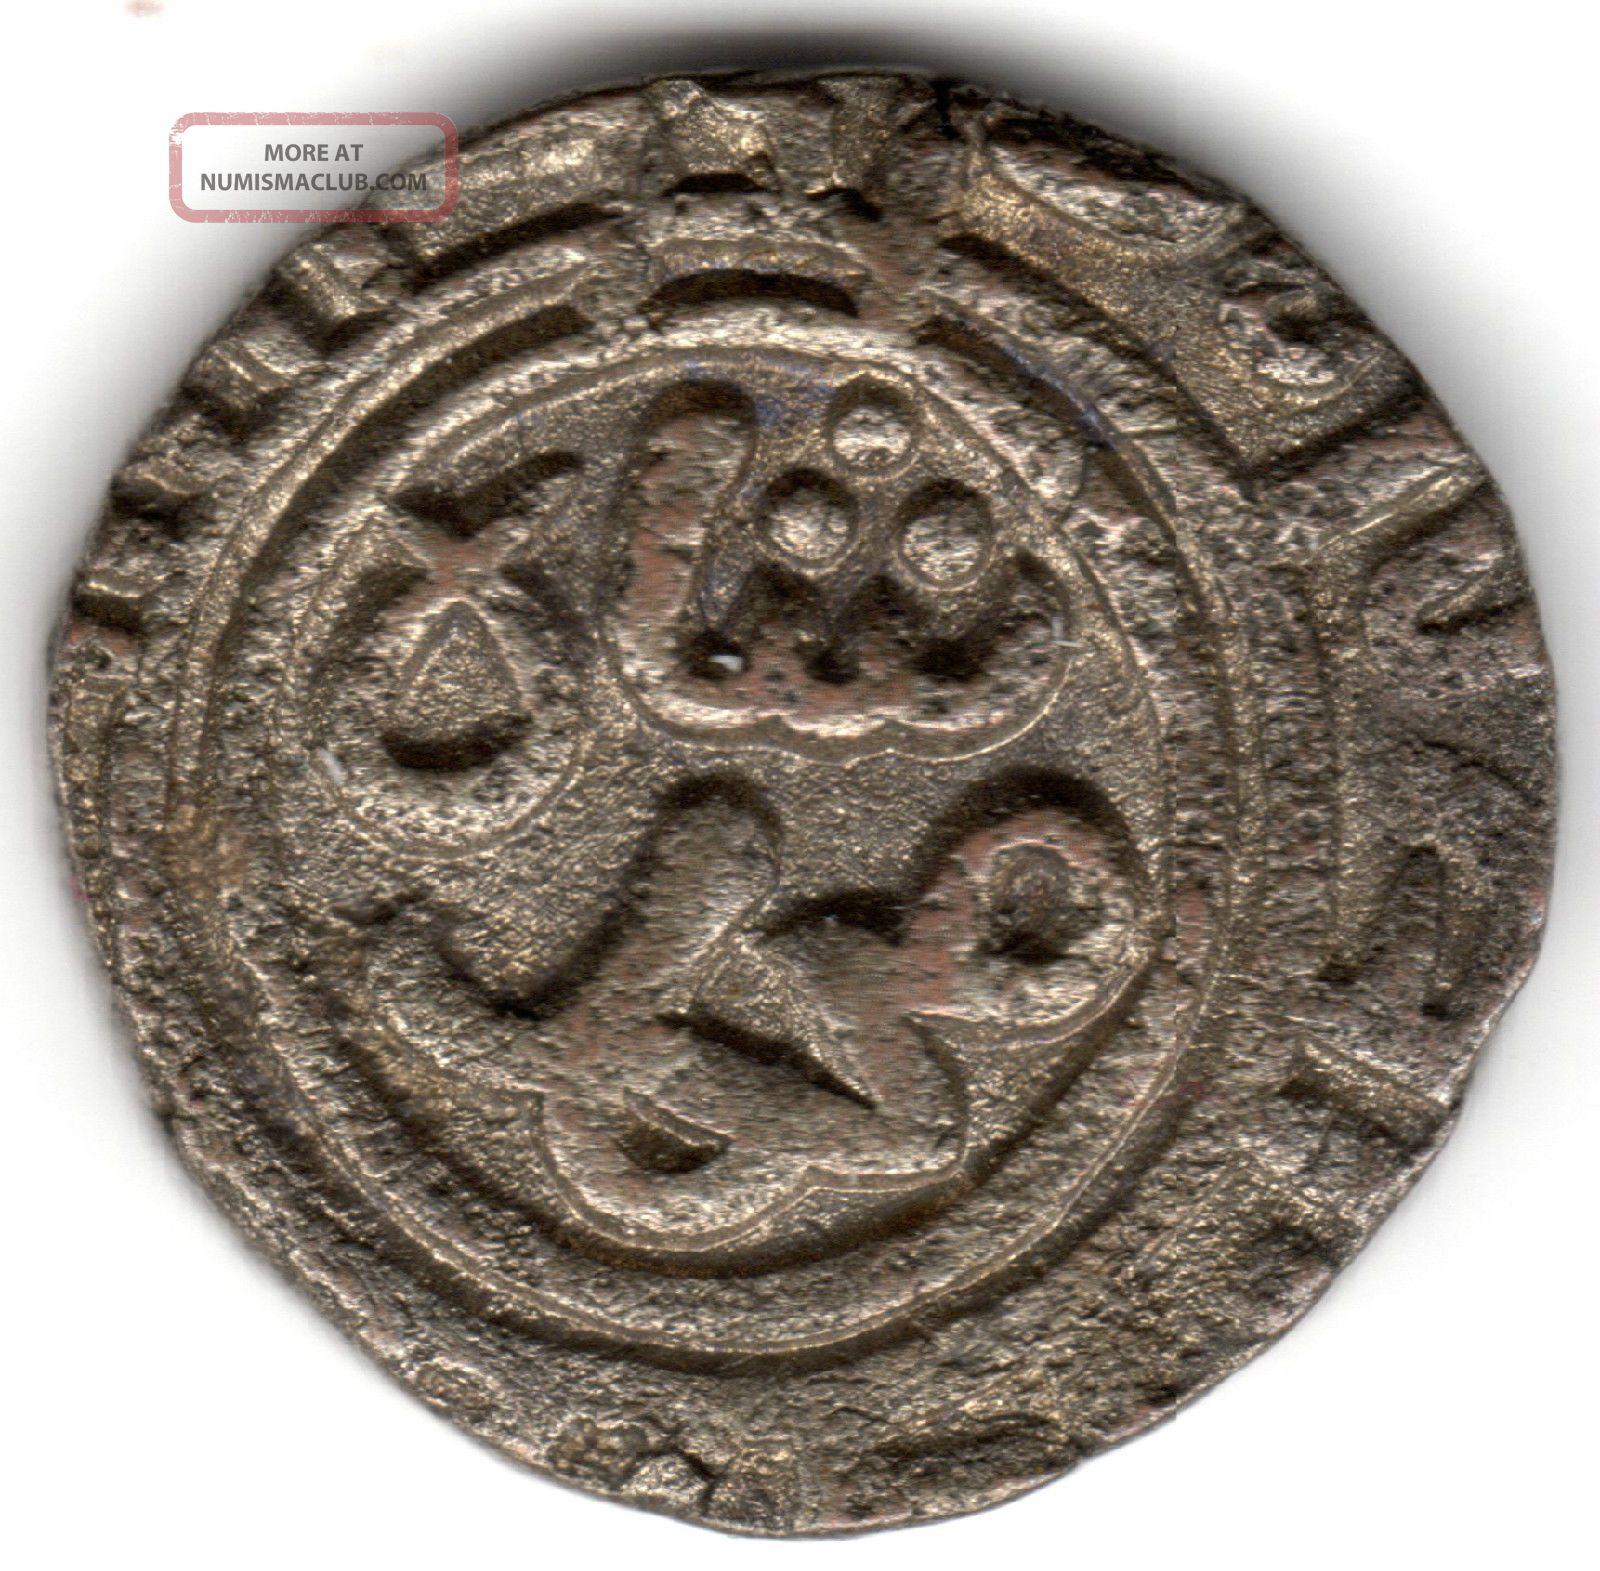 Rare Ancient Coin Silver The Great Sultans Of Delhi ...